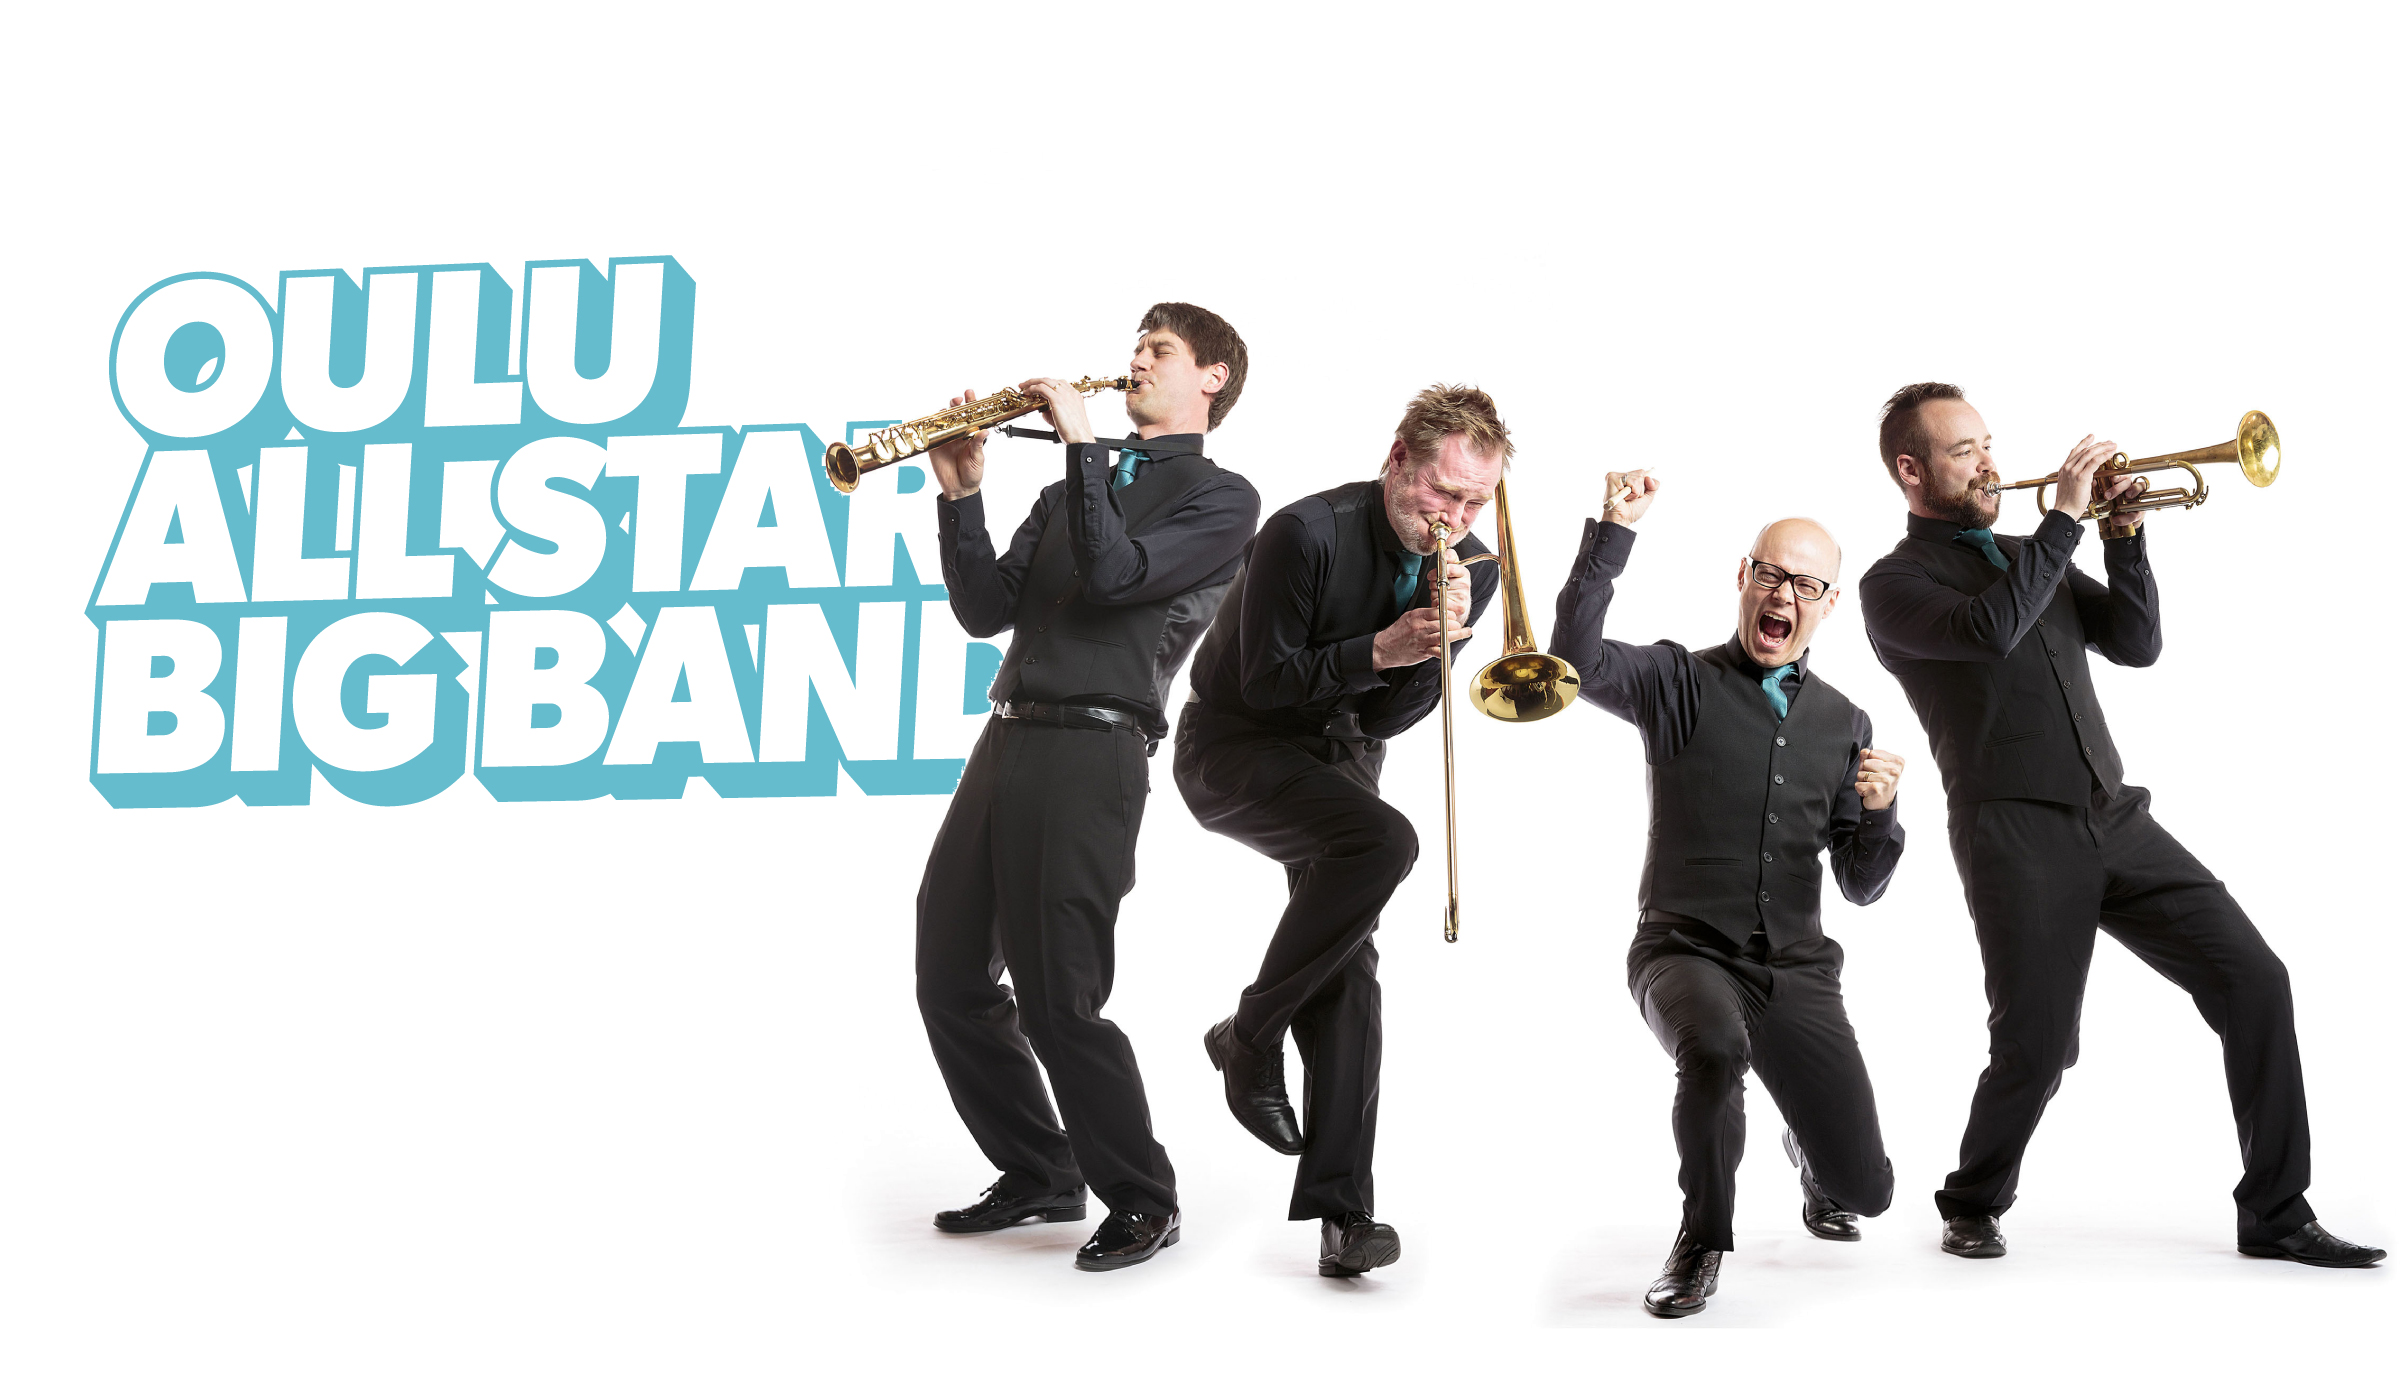 Oulu All Star Big Band